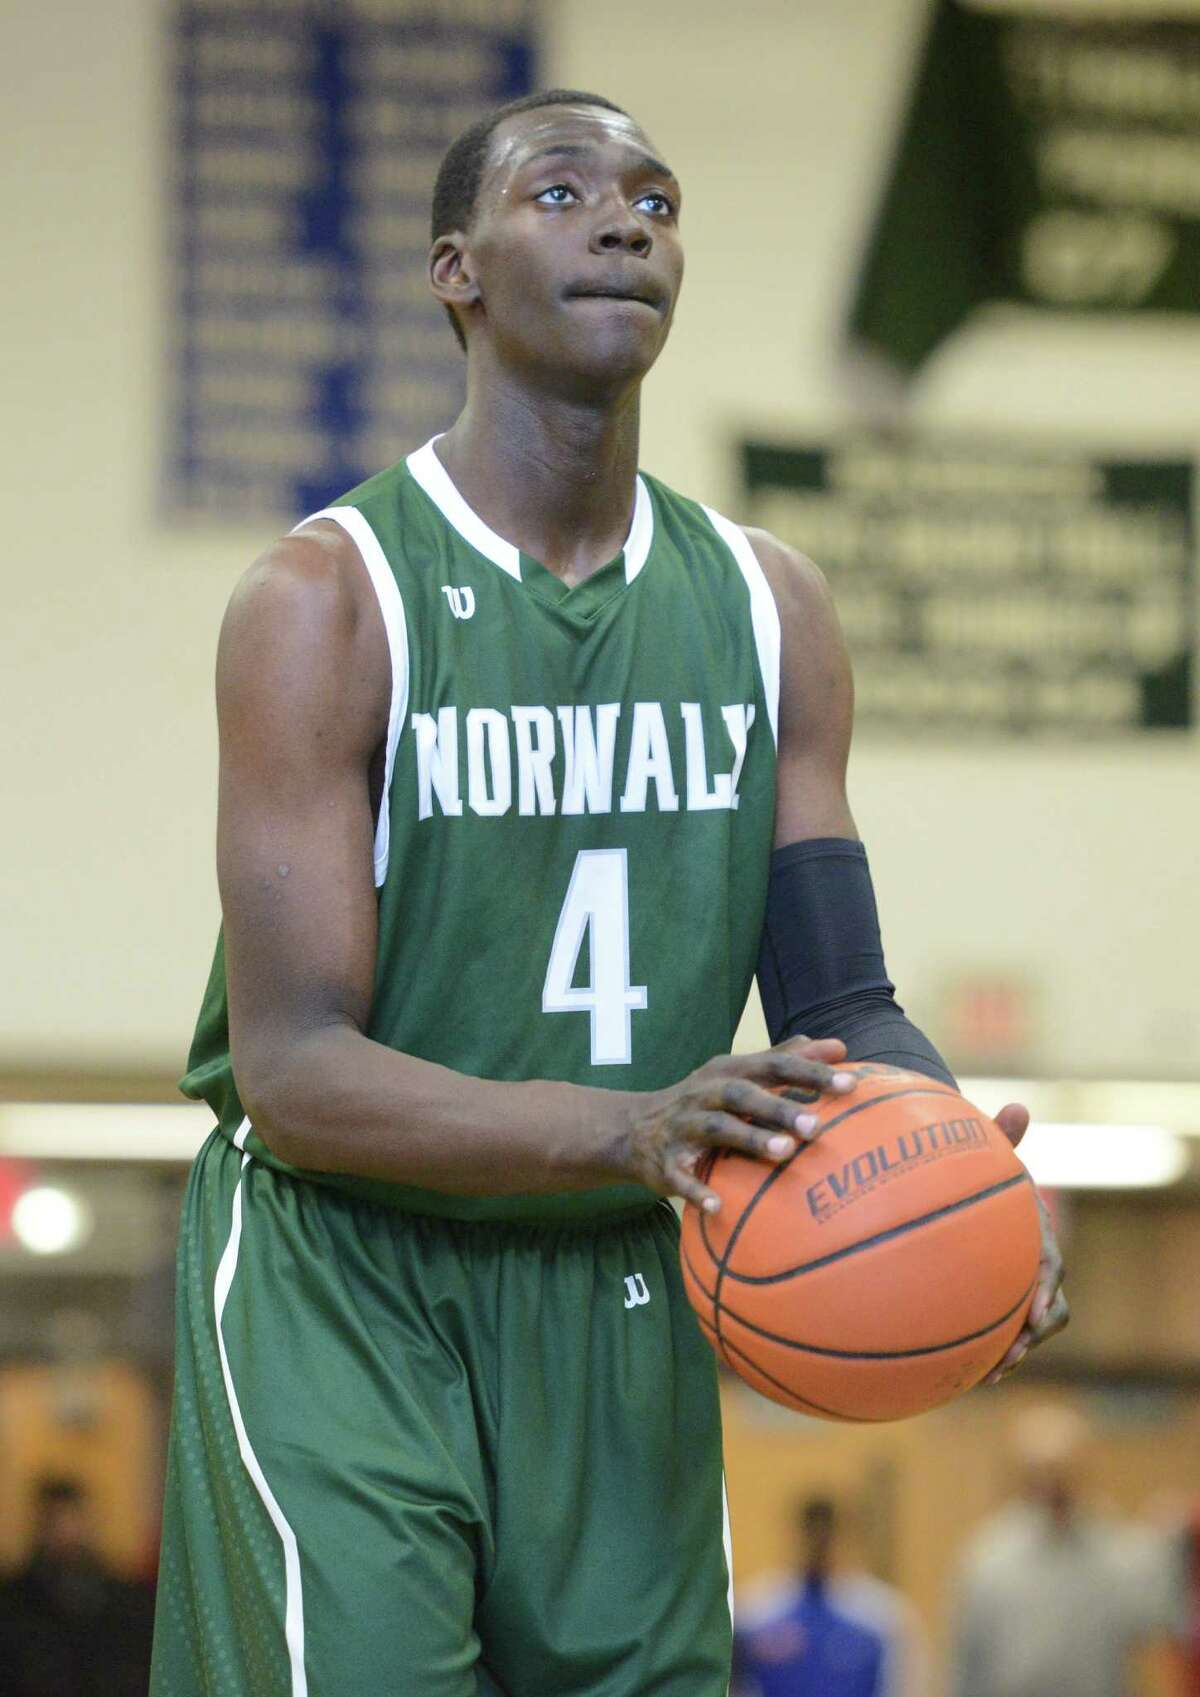 Norwalk's Roy Kane Jr. during their basketball game against Bassick Wednesday, Feb. 18, 2015 at Bassick High School in Bridgeport, Conn.